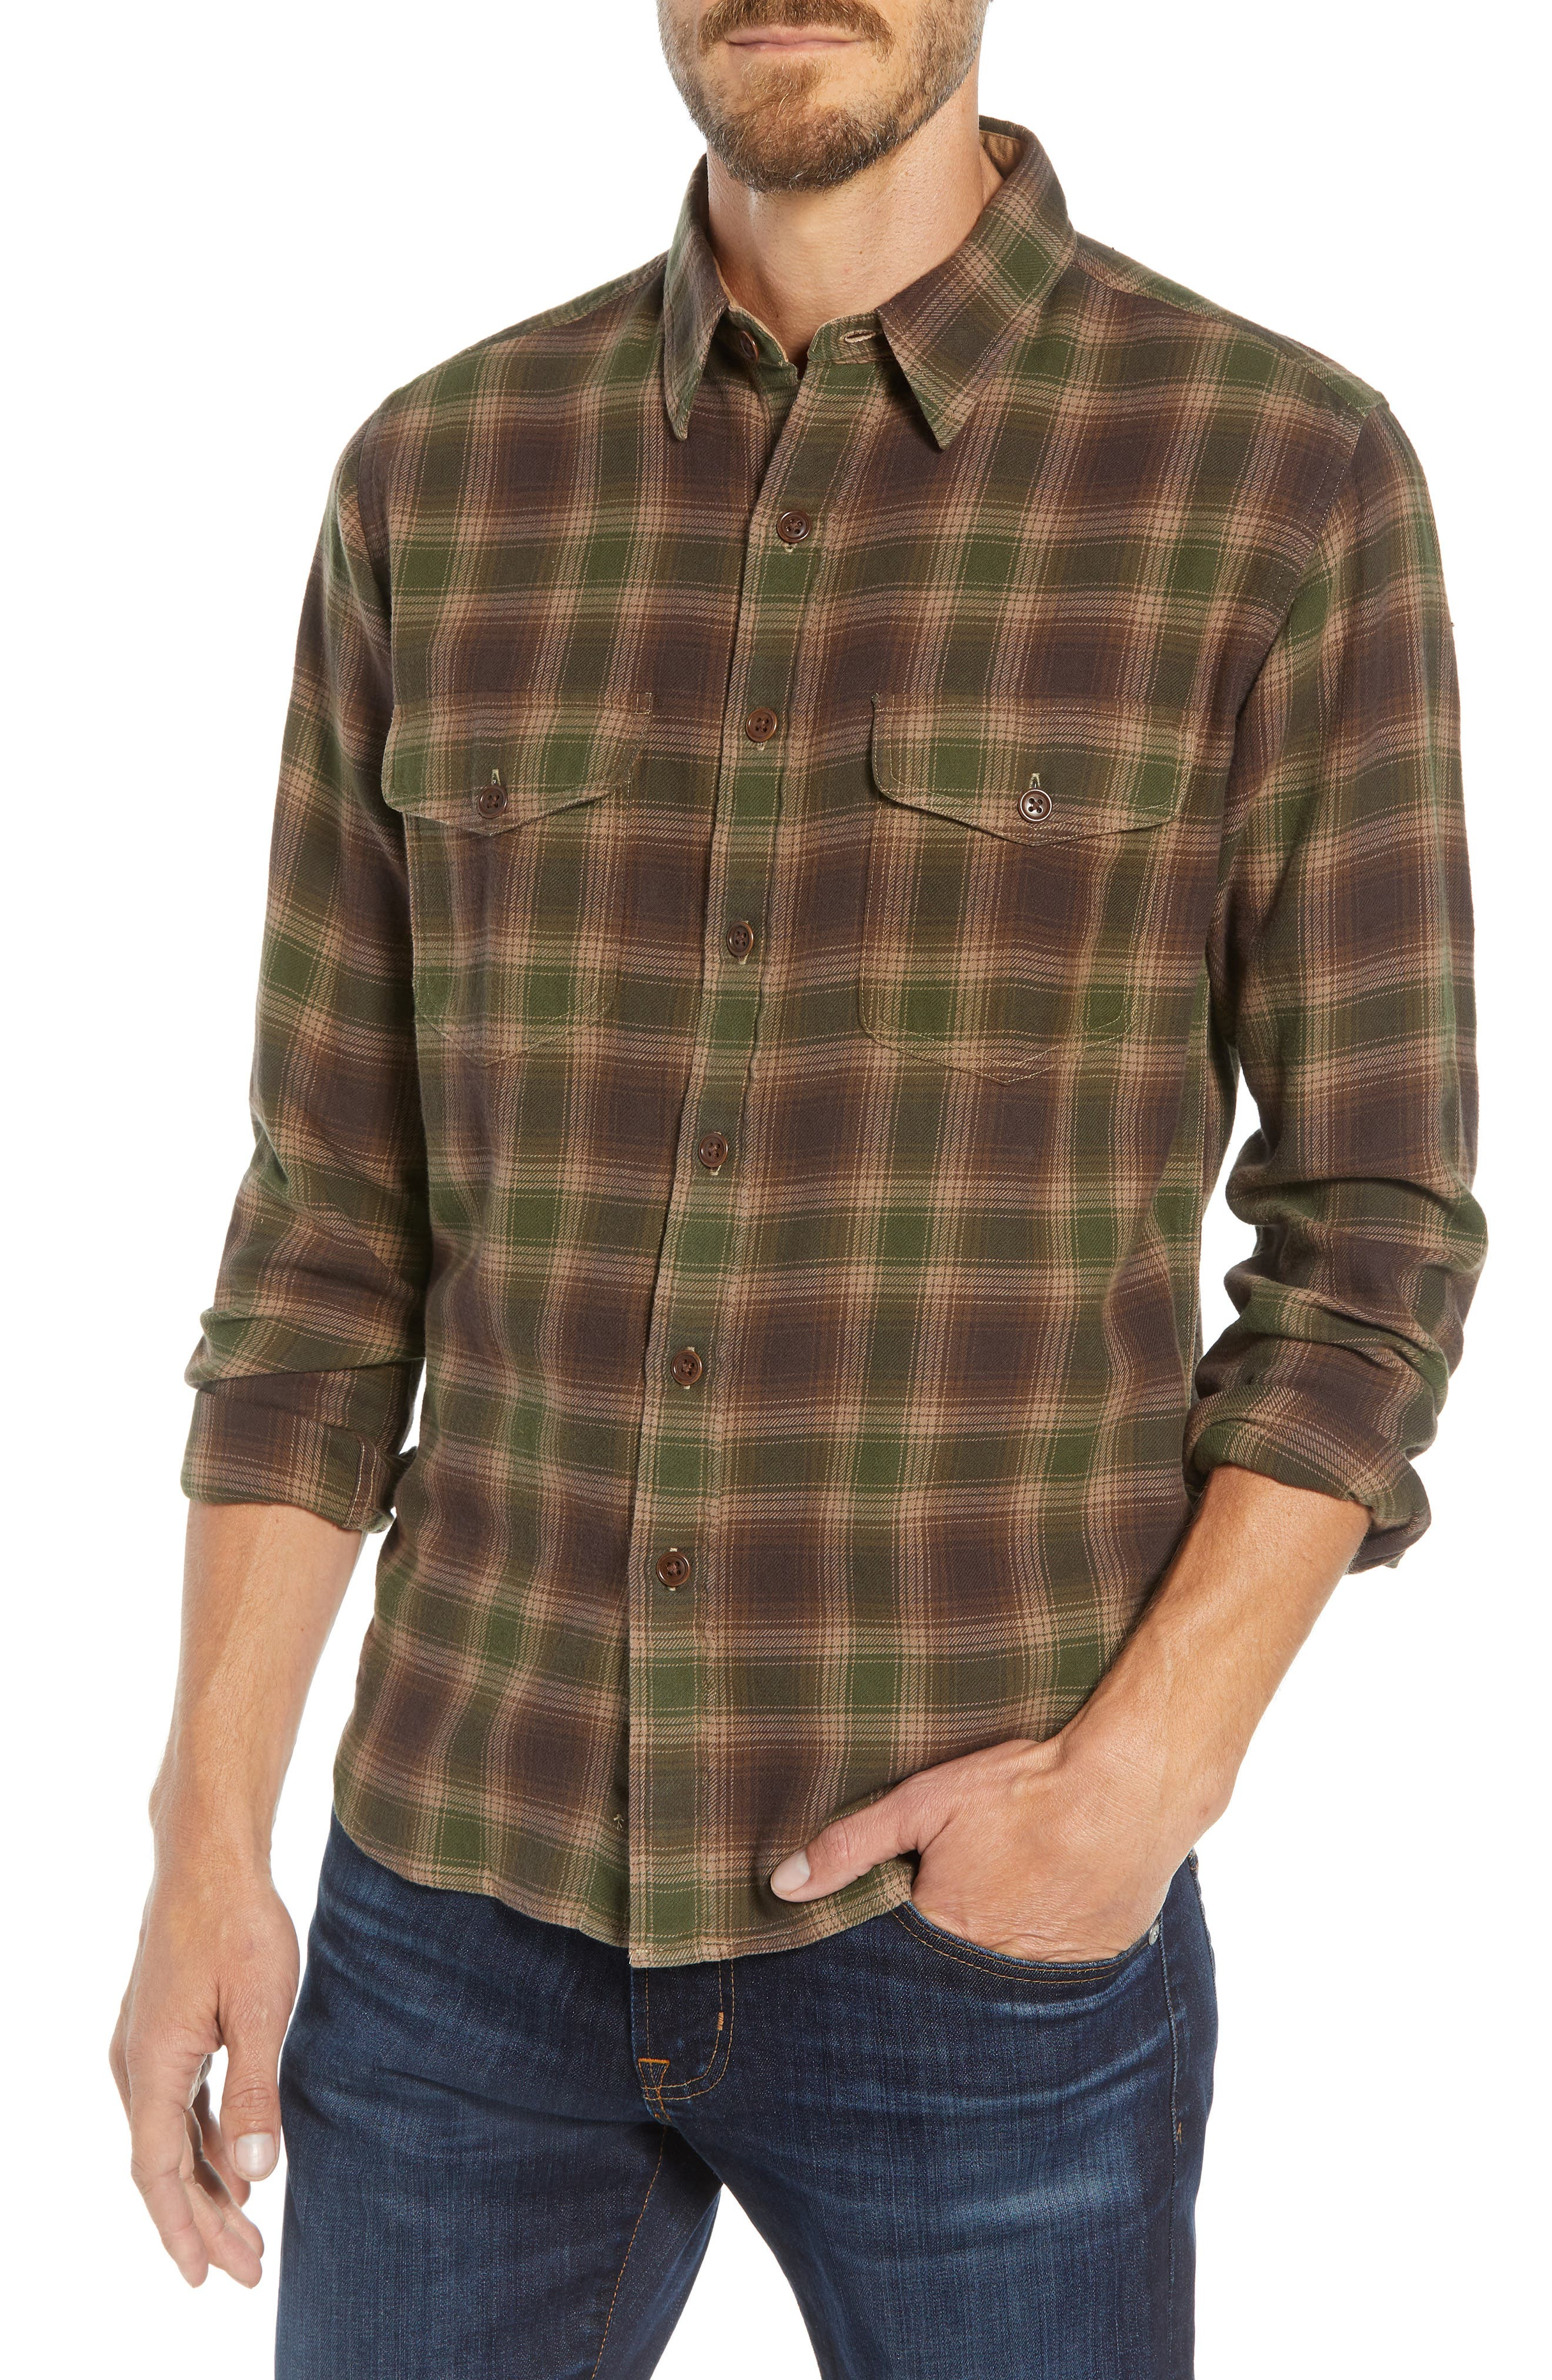 Frye Marlon Plaid Shirt, Brown